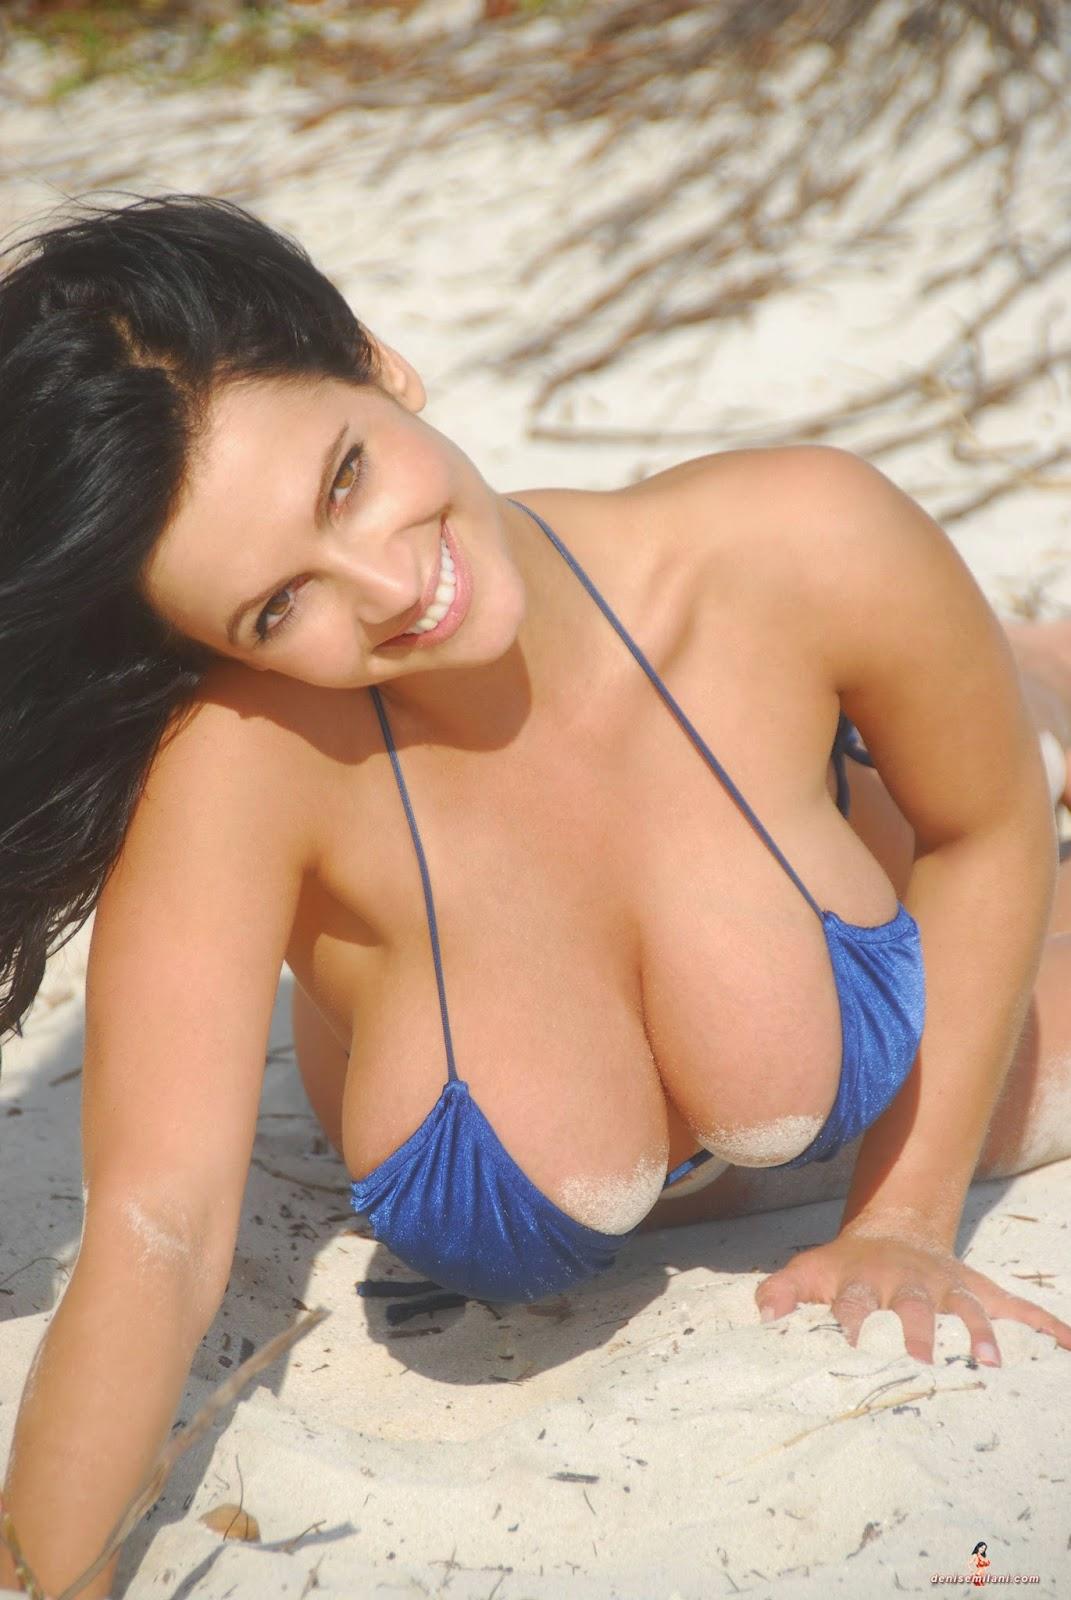 Sweet Girl Face Wallpaper Denise Milani Archives Blue Thong Blue Bikini